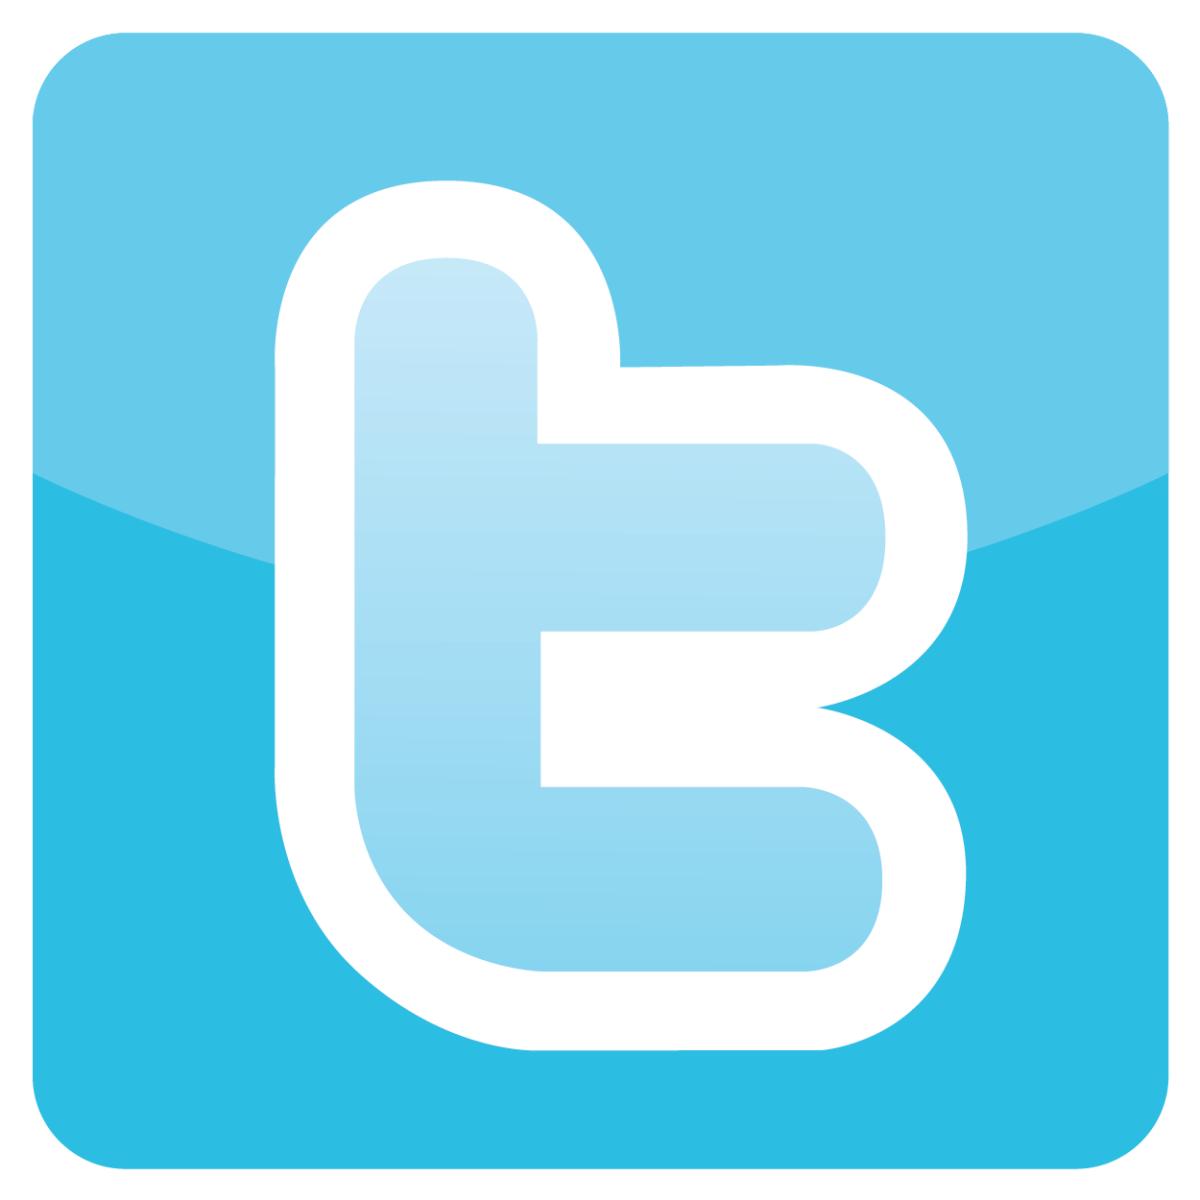 Cobone on Twitter